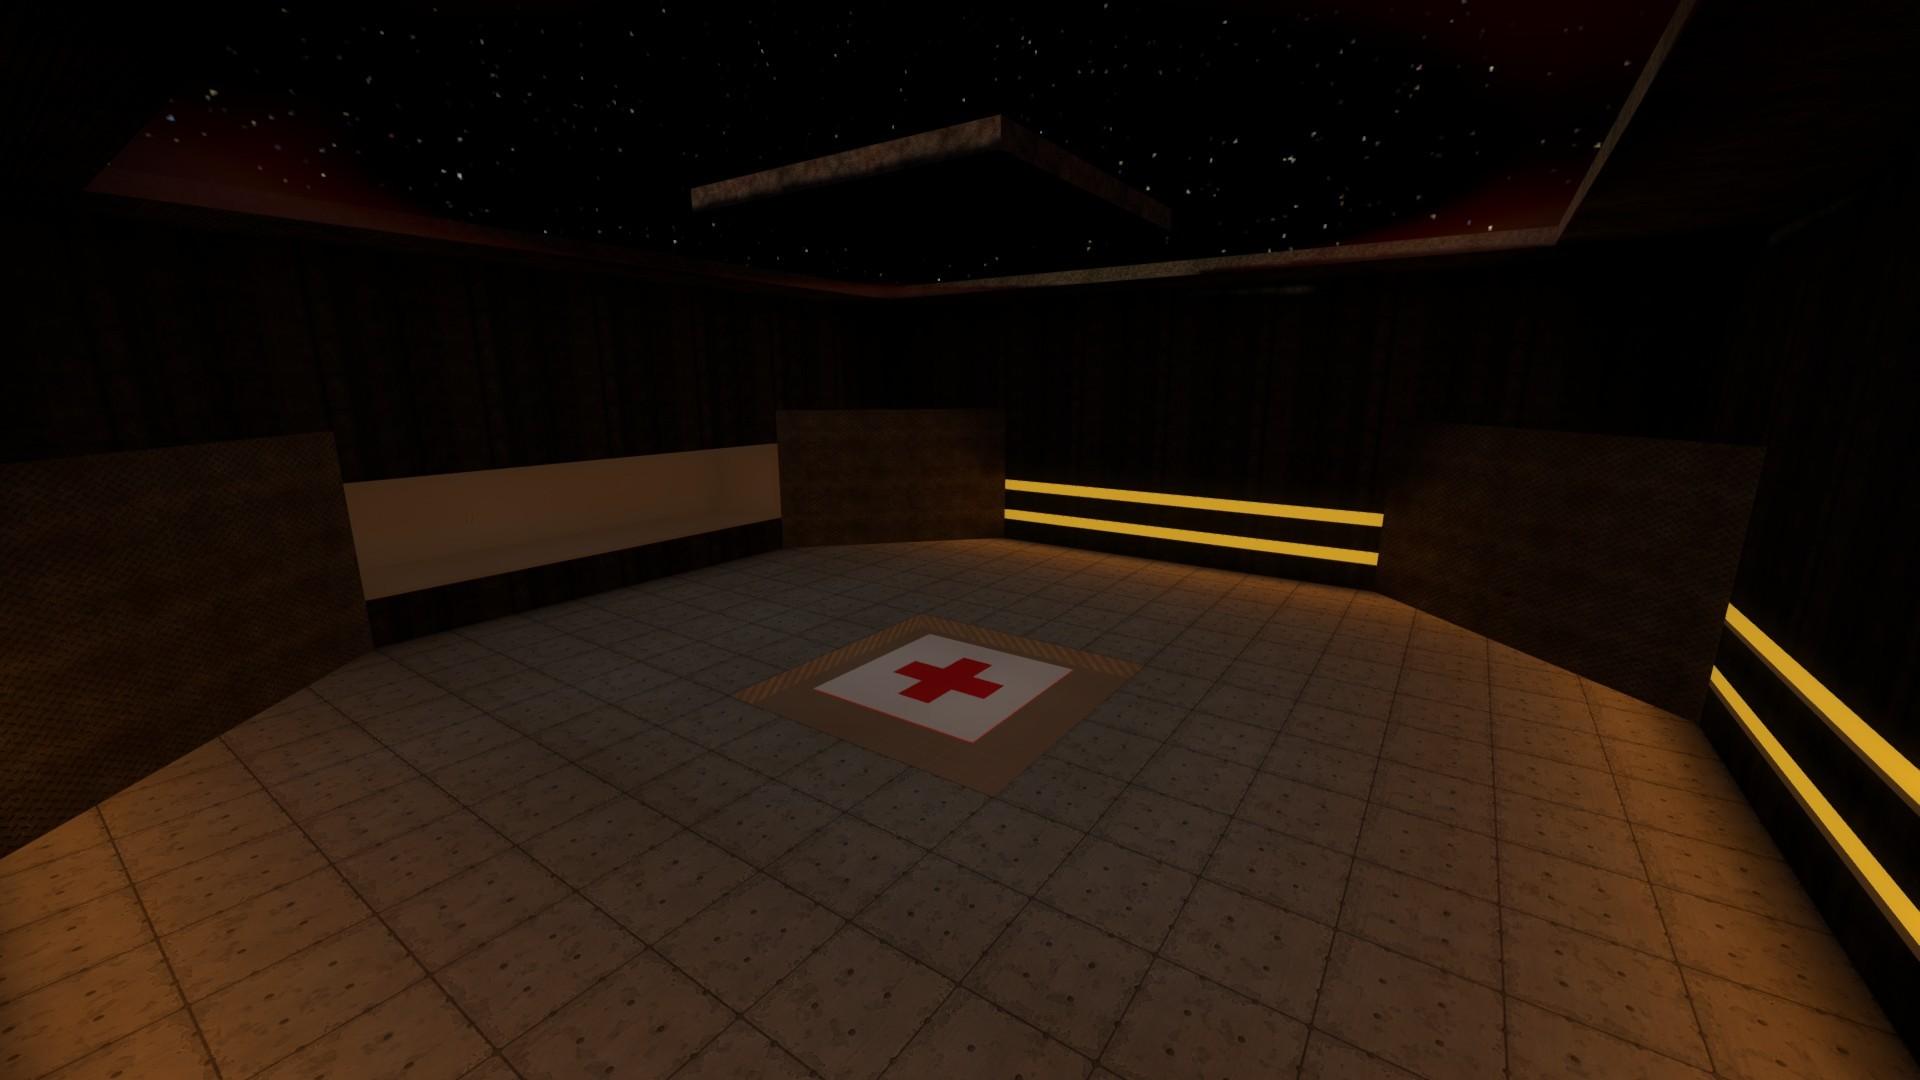 mg_ghosts_multigame_v2 WiP screenshot #3